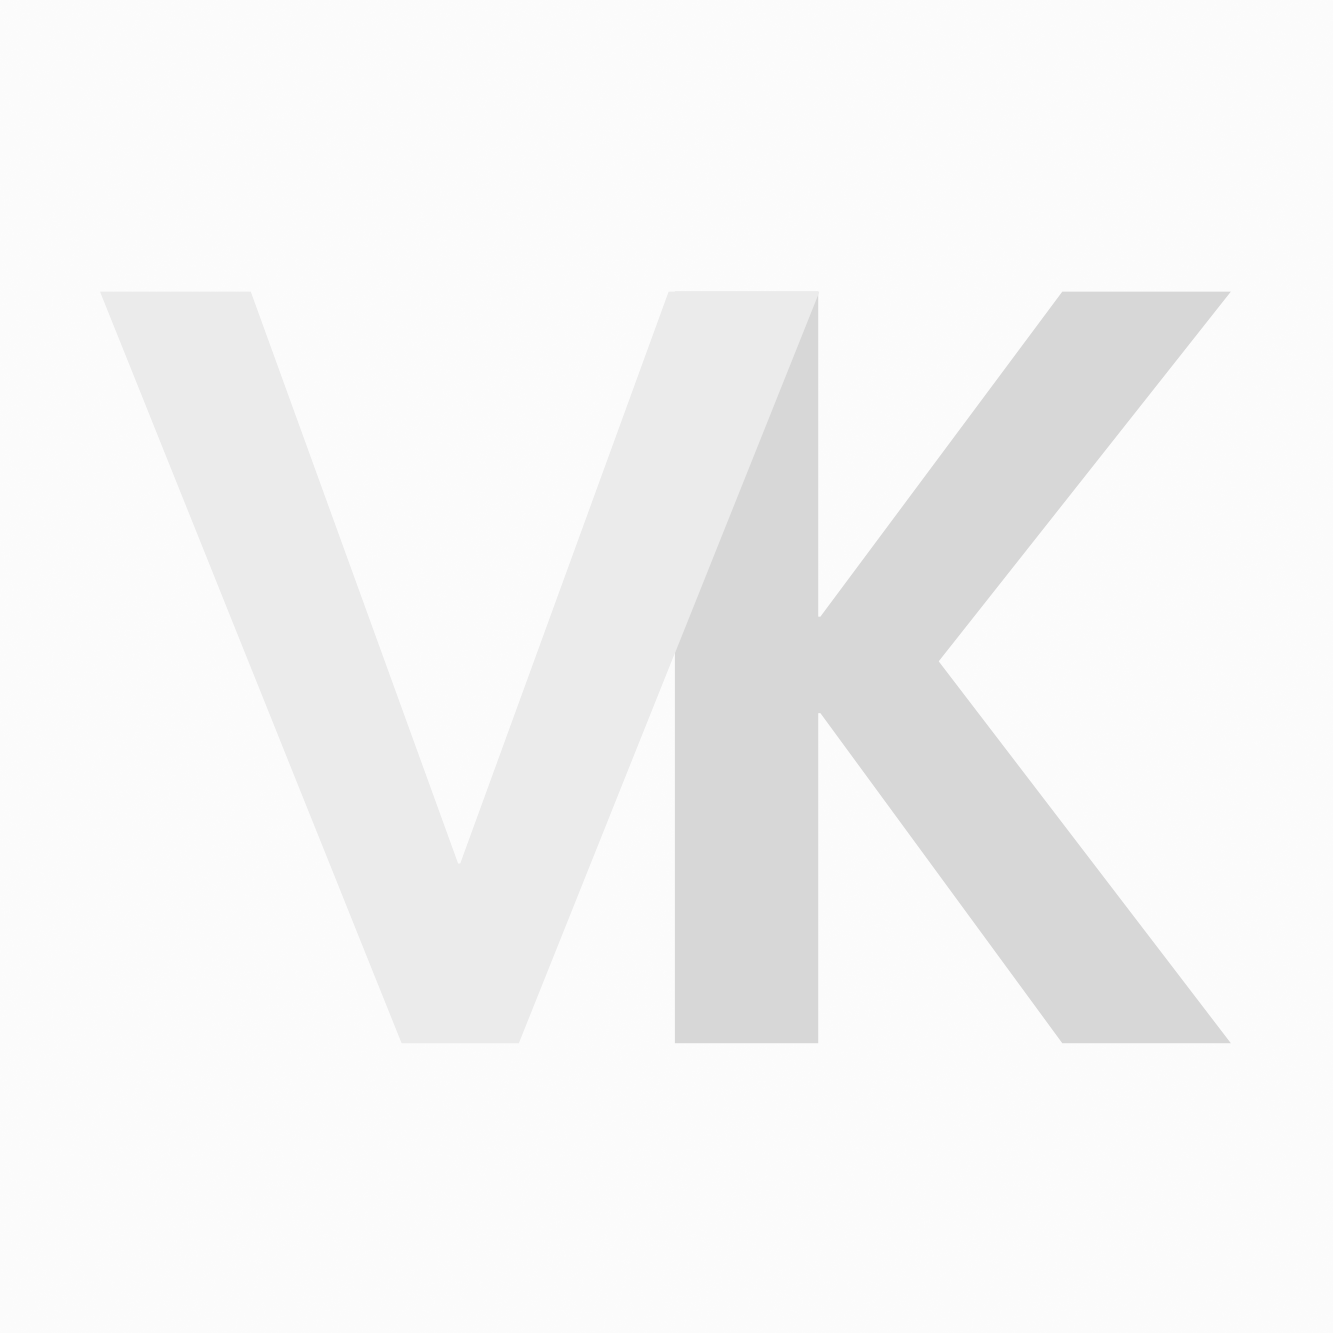 Kis Kerabond Strenghtener stap 2 500ml